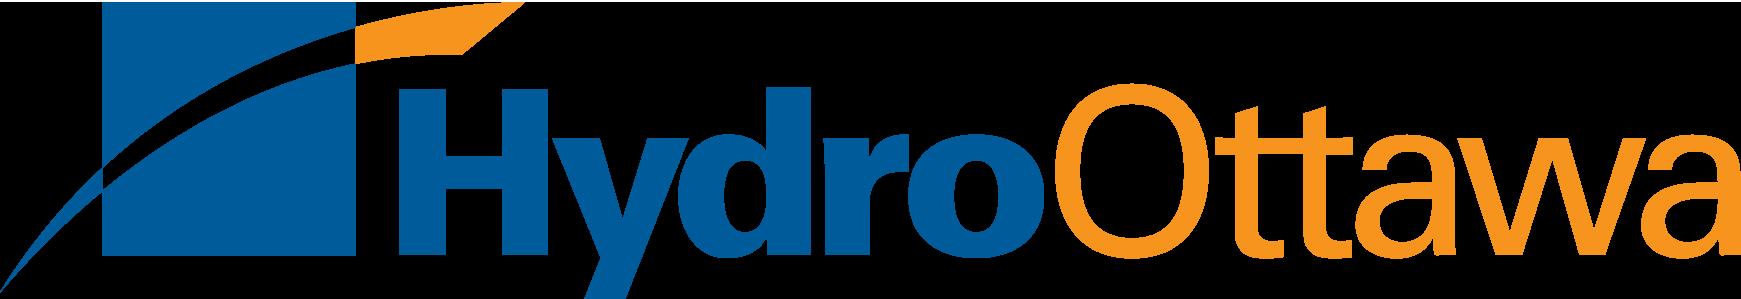 Image: Hydro Ottawa logo